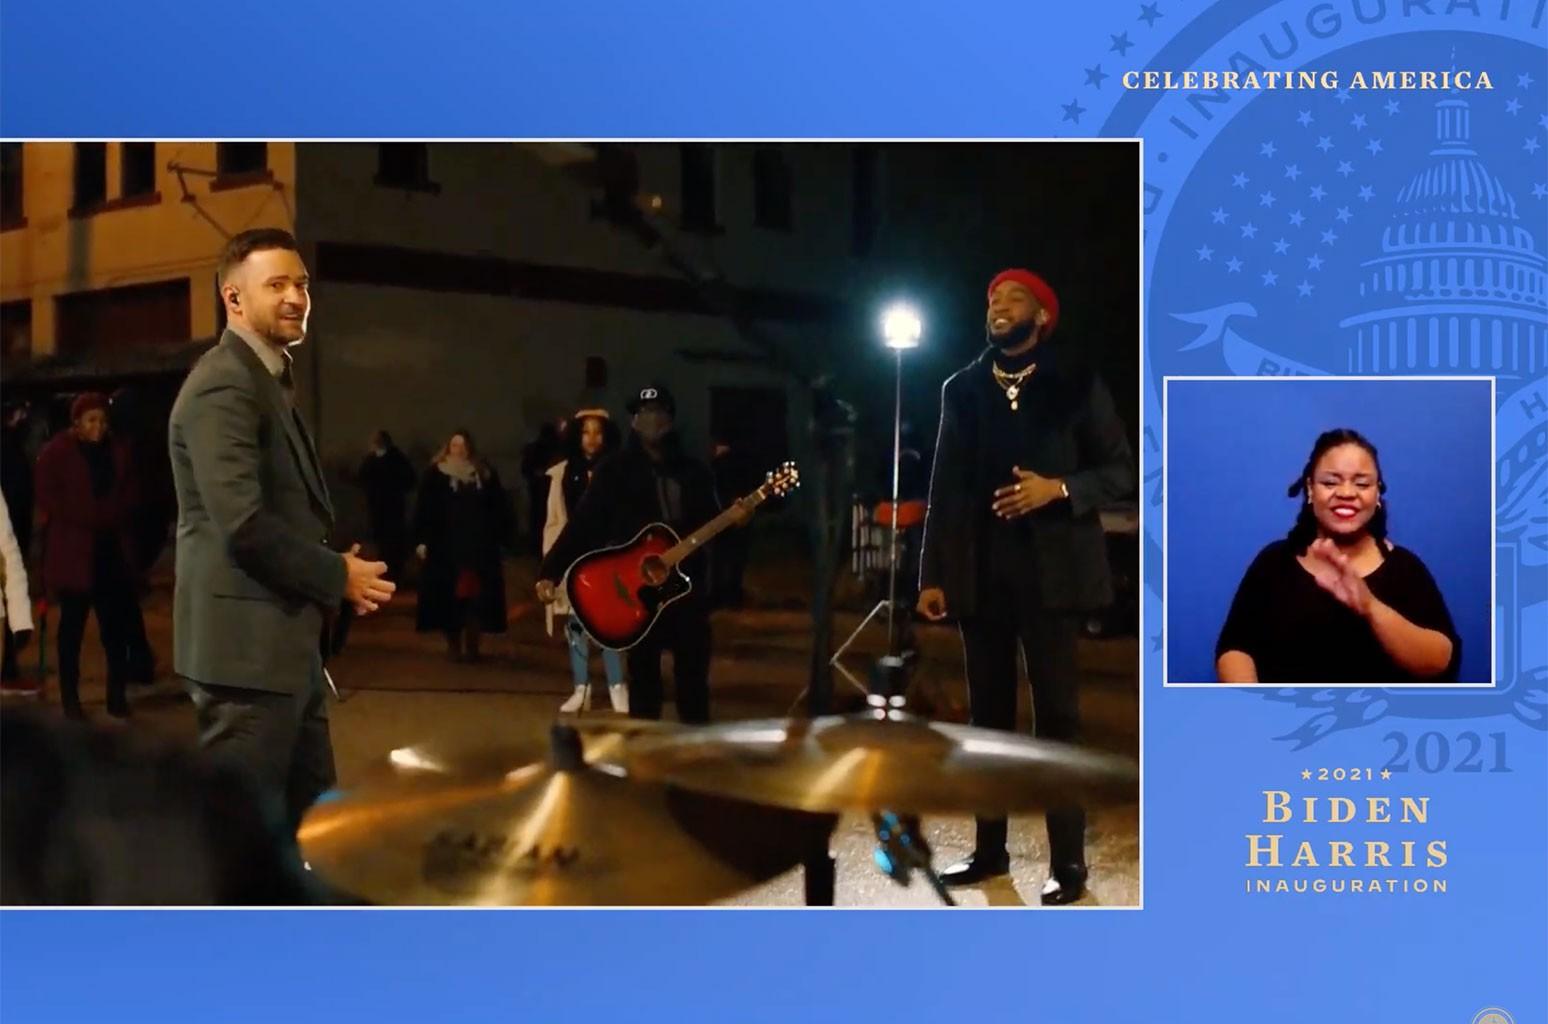 Джастин Тимберлейк и Муравей Клемонс планируют лучшие дни на мероприятии «Celebrating America»